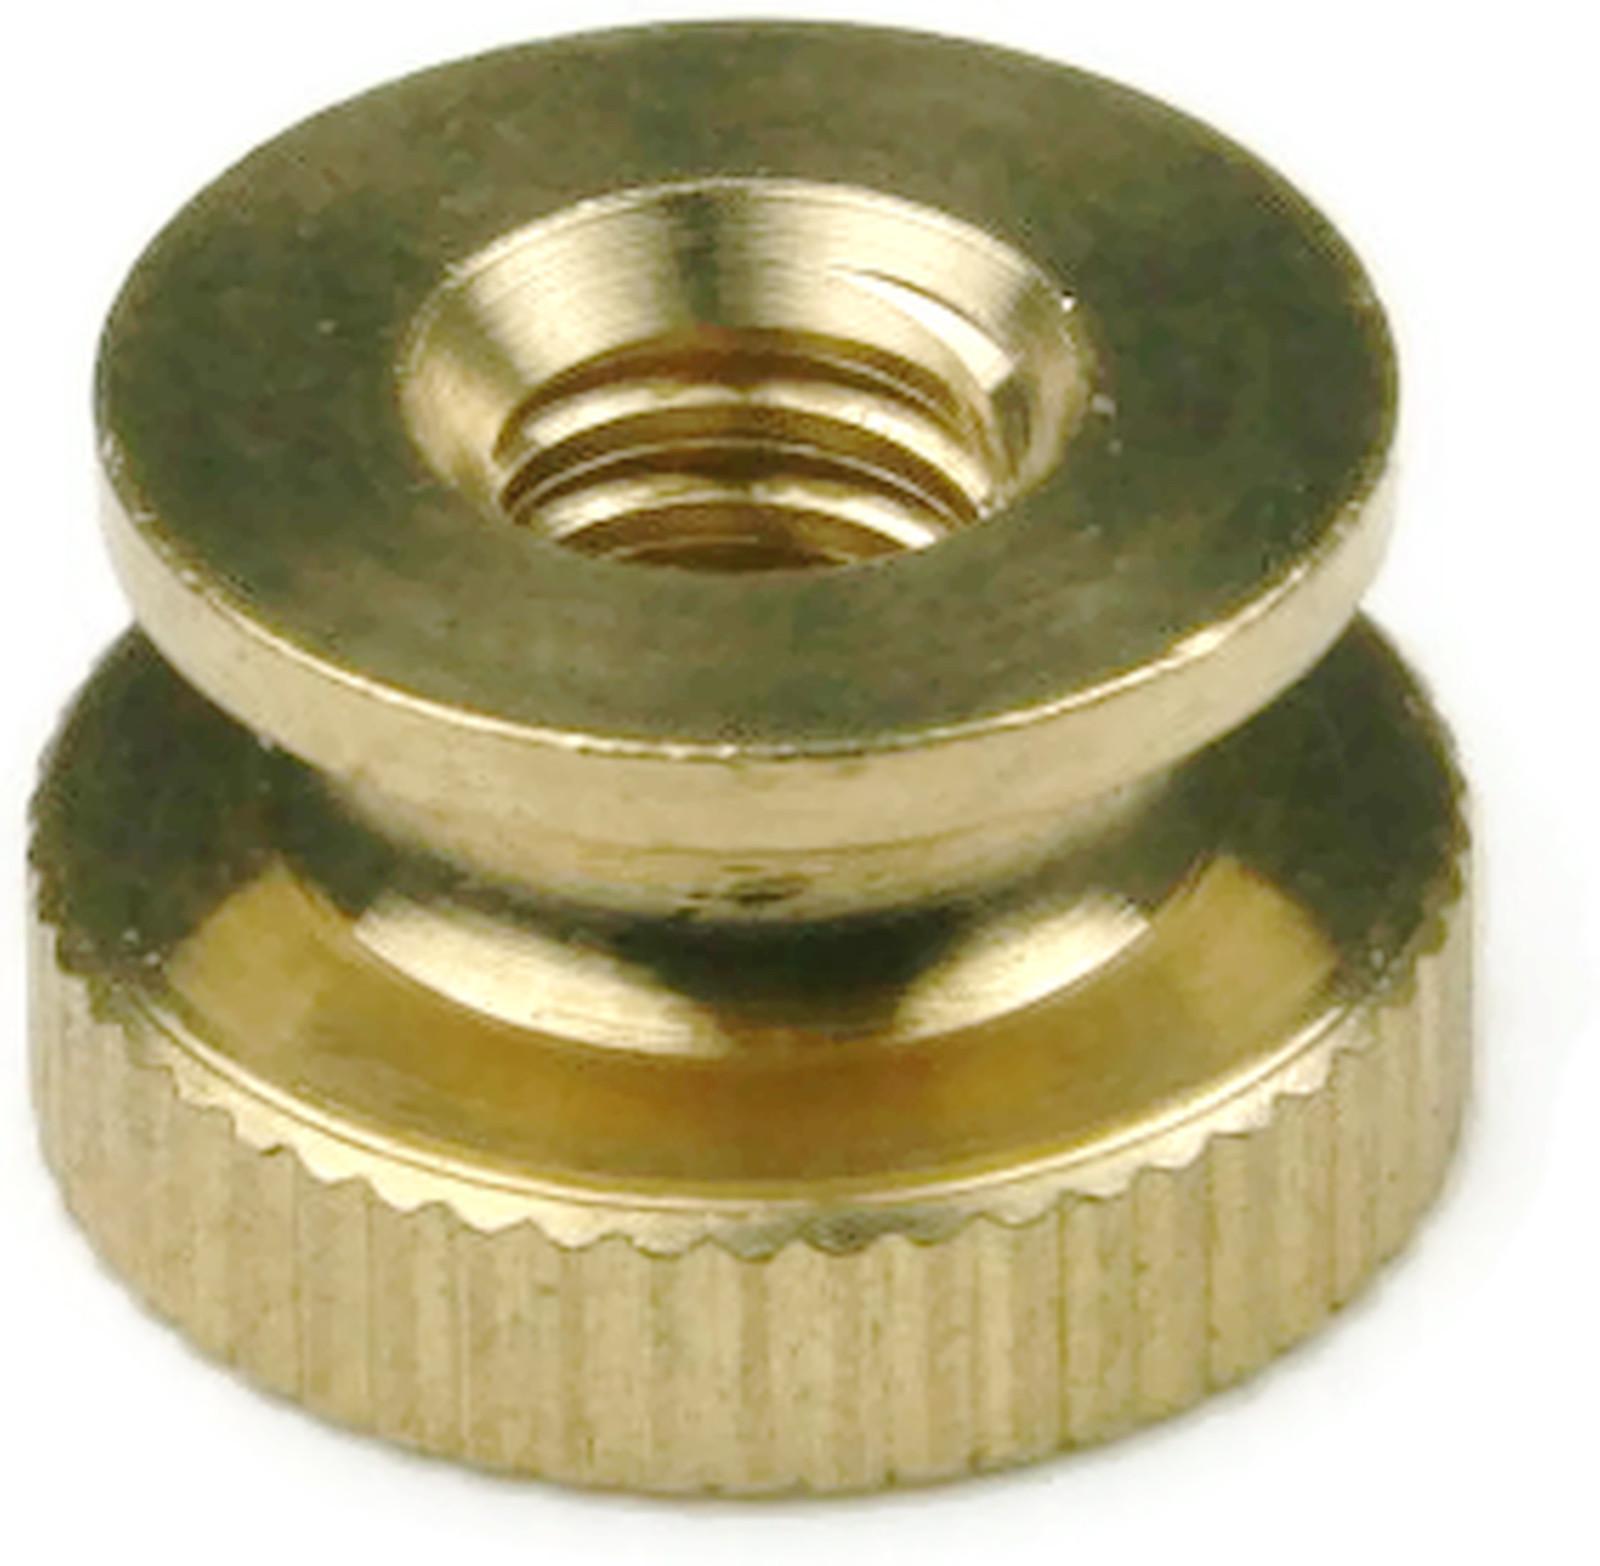 Brass Solid Knurled Thumb Nut Unc 8 32 Qty 25